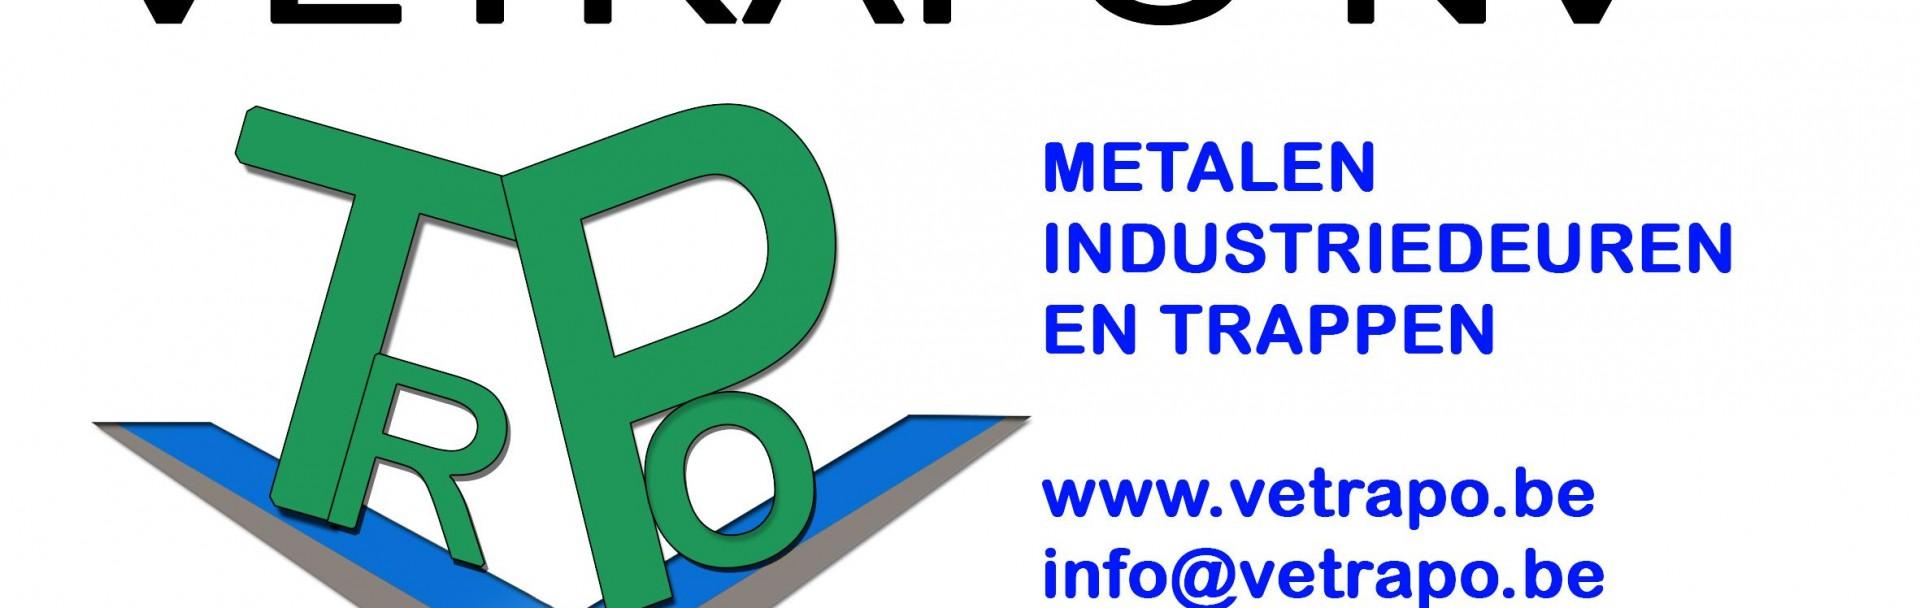 logo-VETRAPO300dpi-1-page-001-1